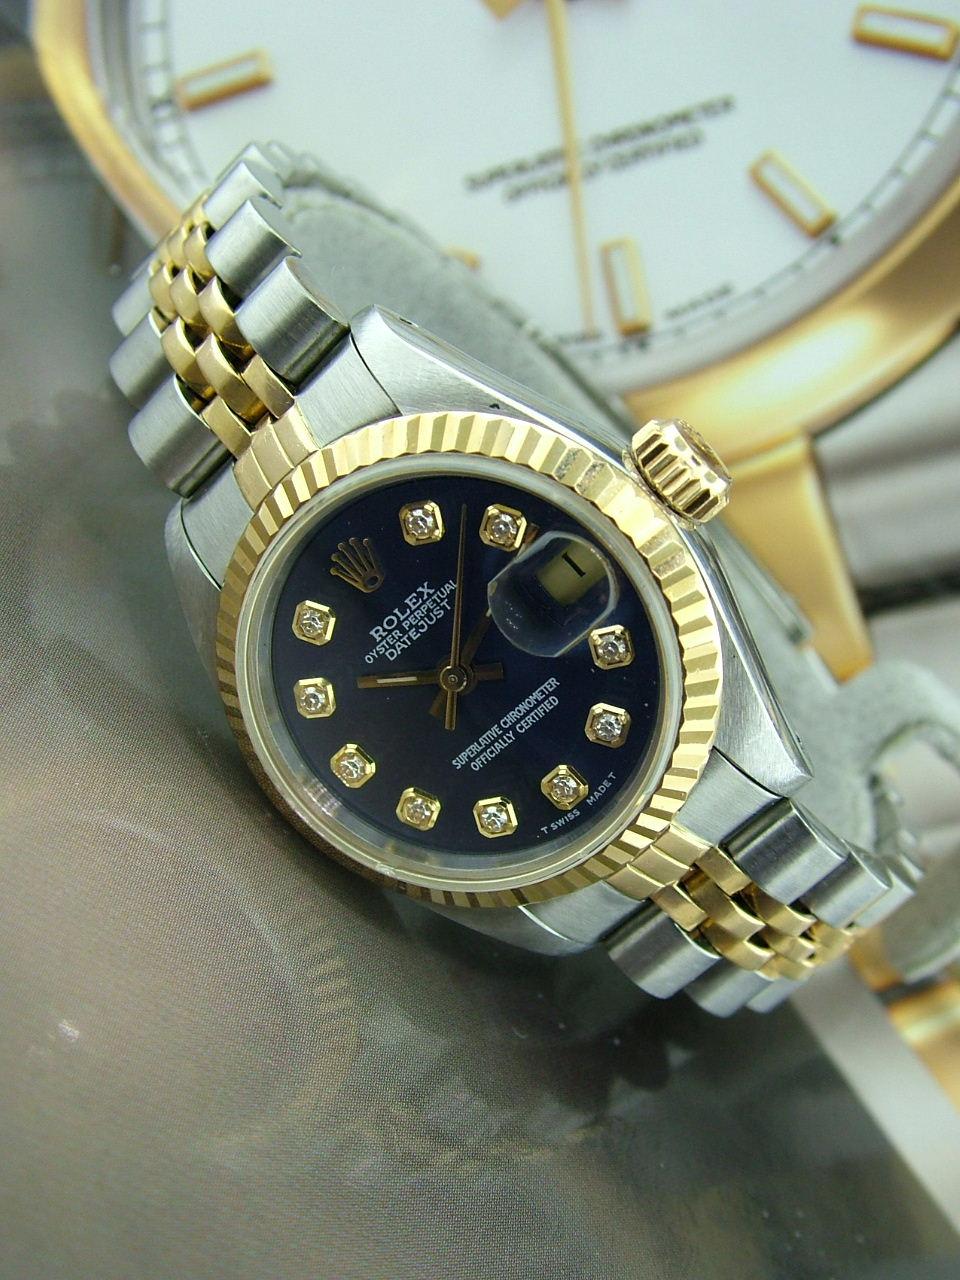 f44f0b8ff للمتميزين فقط للبيع ساعة رولكس اصلية | المؤشرنت